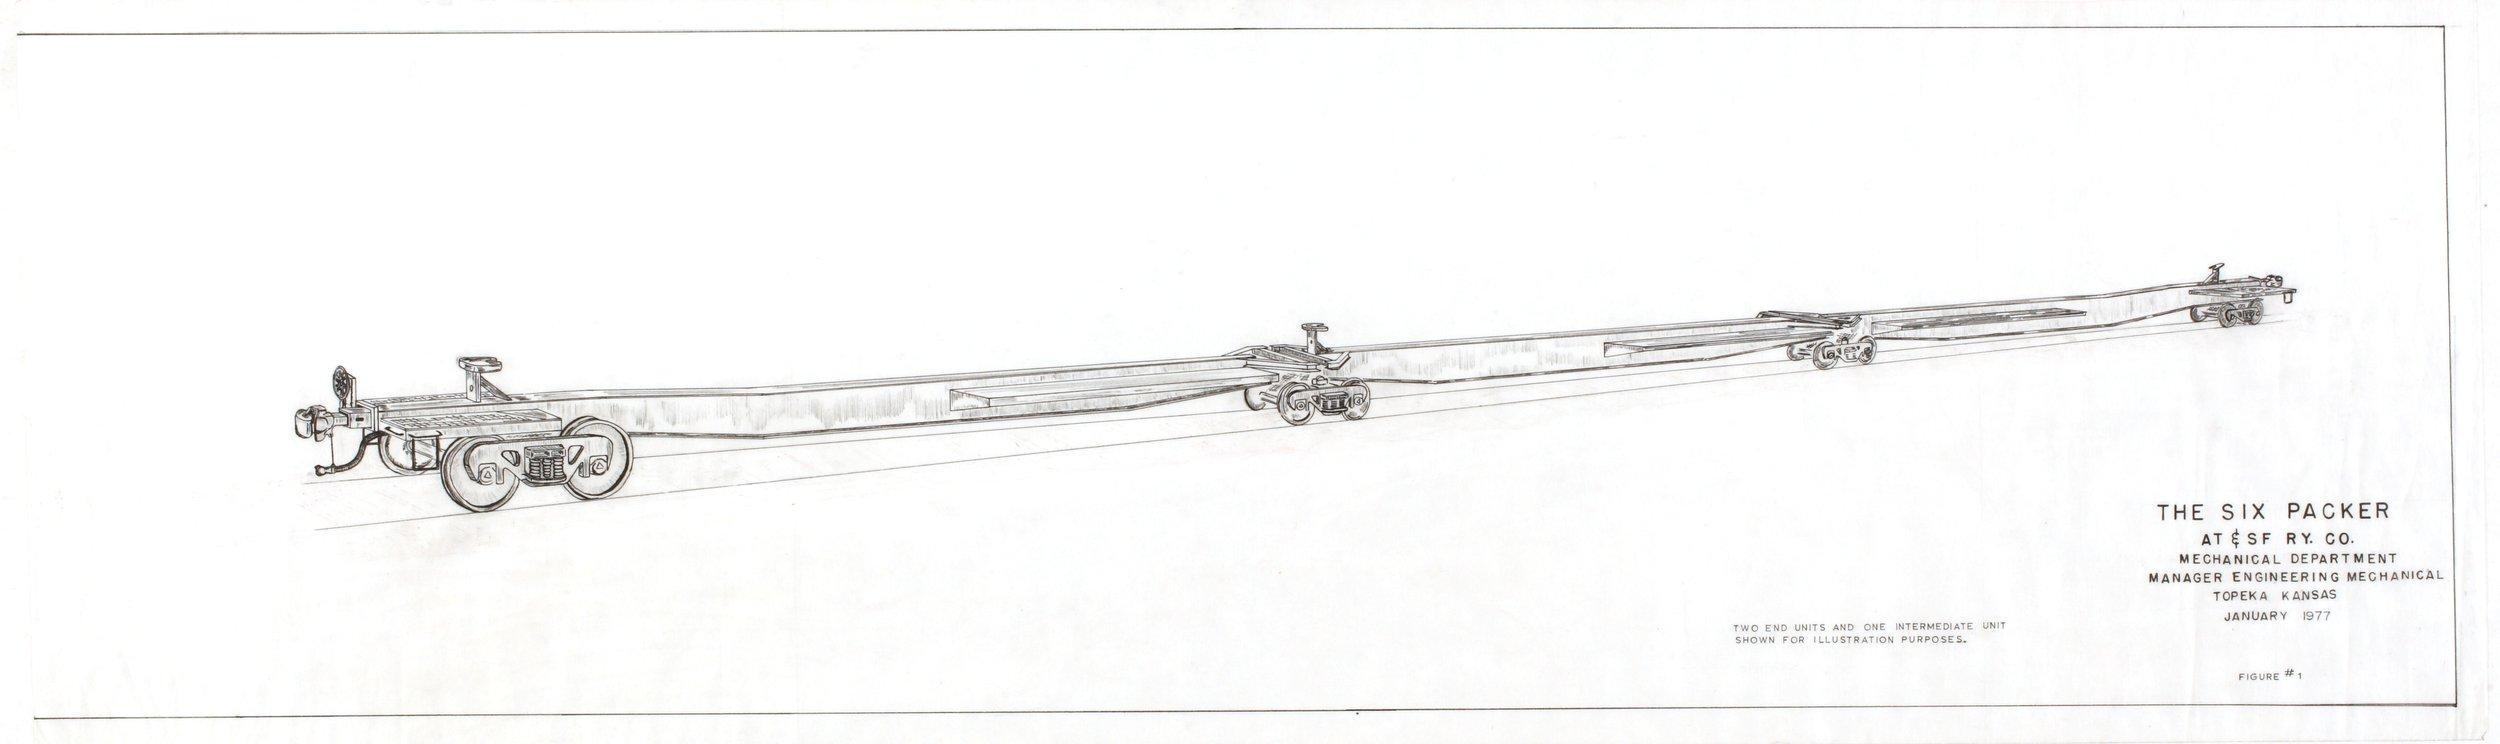 Atchison, Topeka & Santa Fe Railway Company six packer